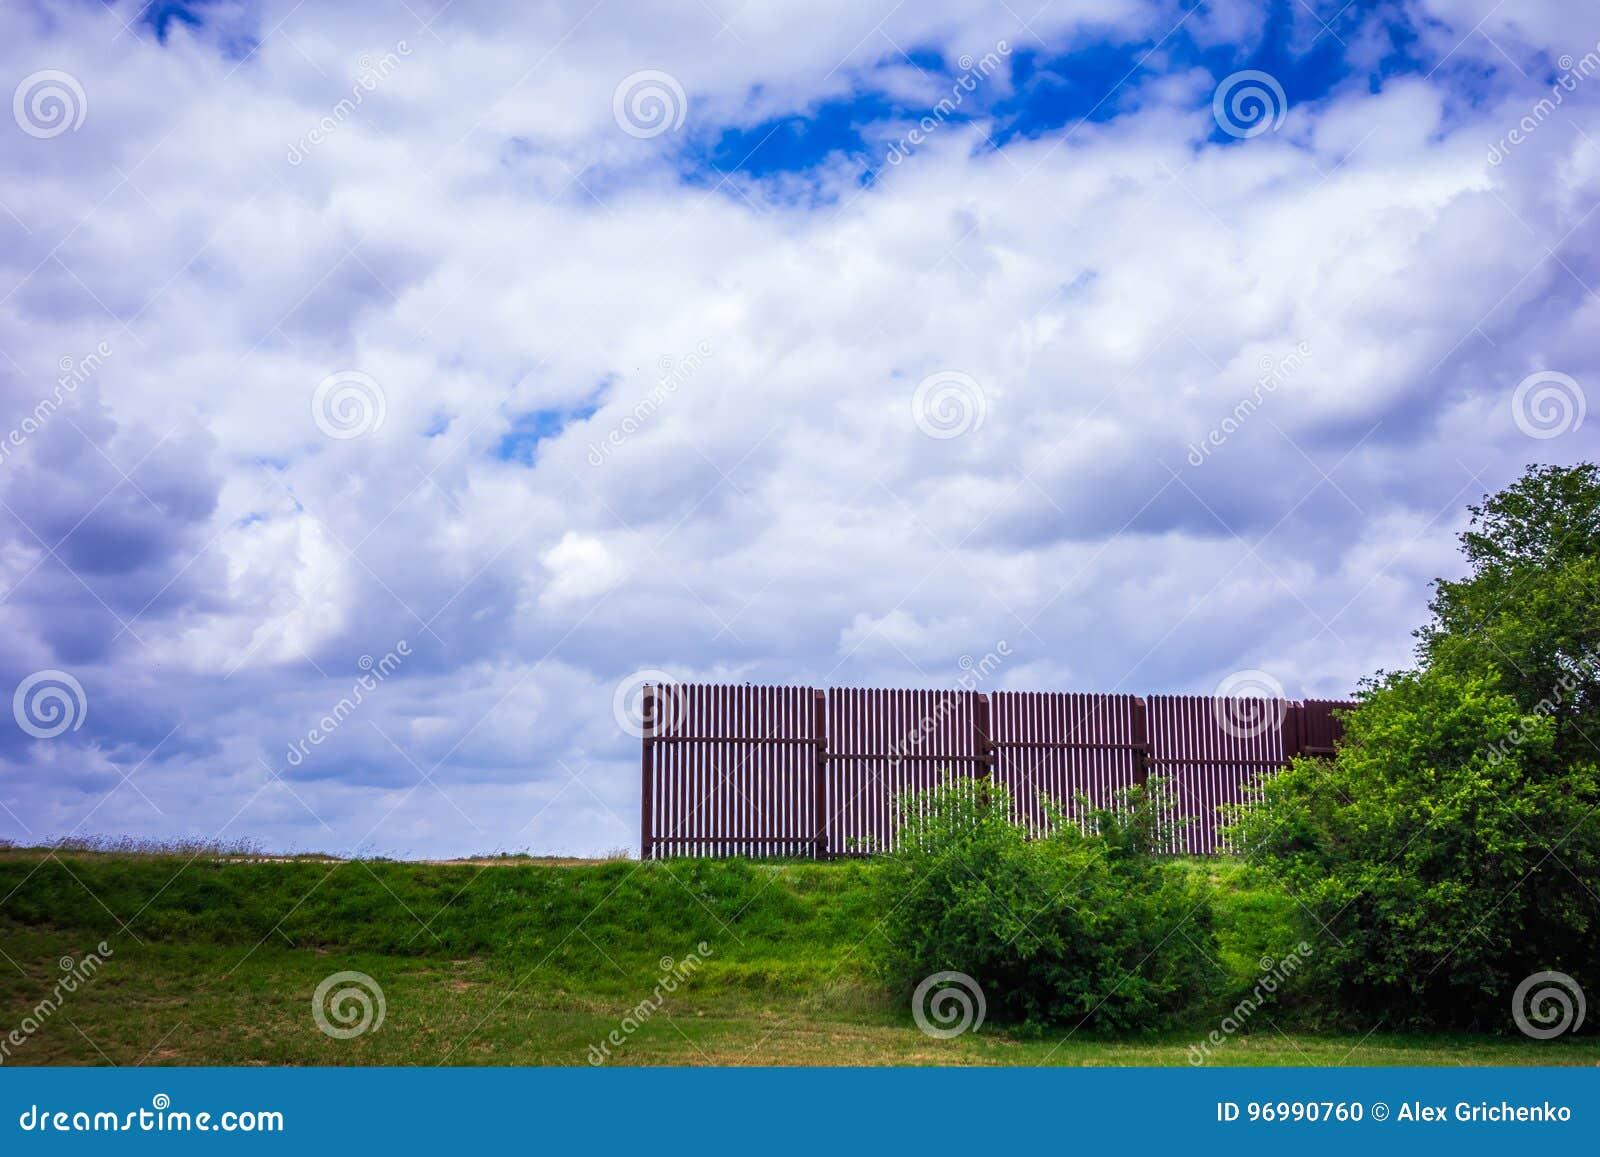 Texas mexico border wall separating from usa